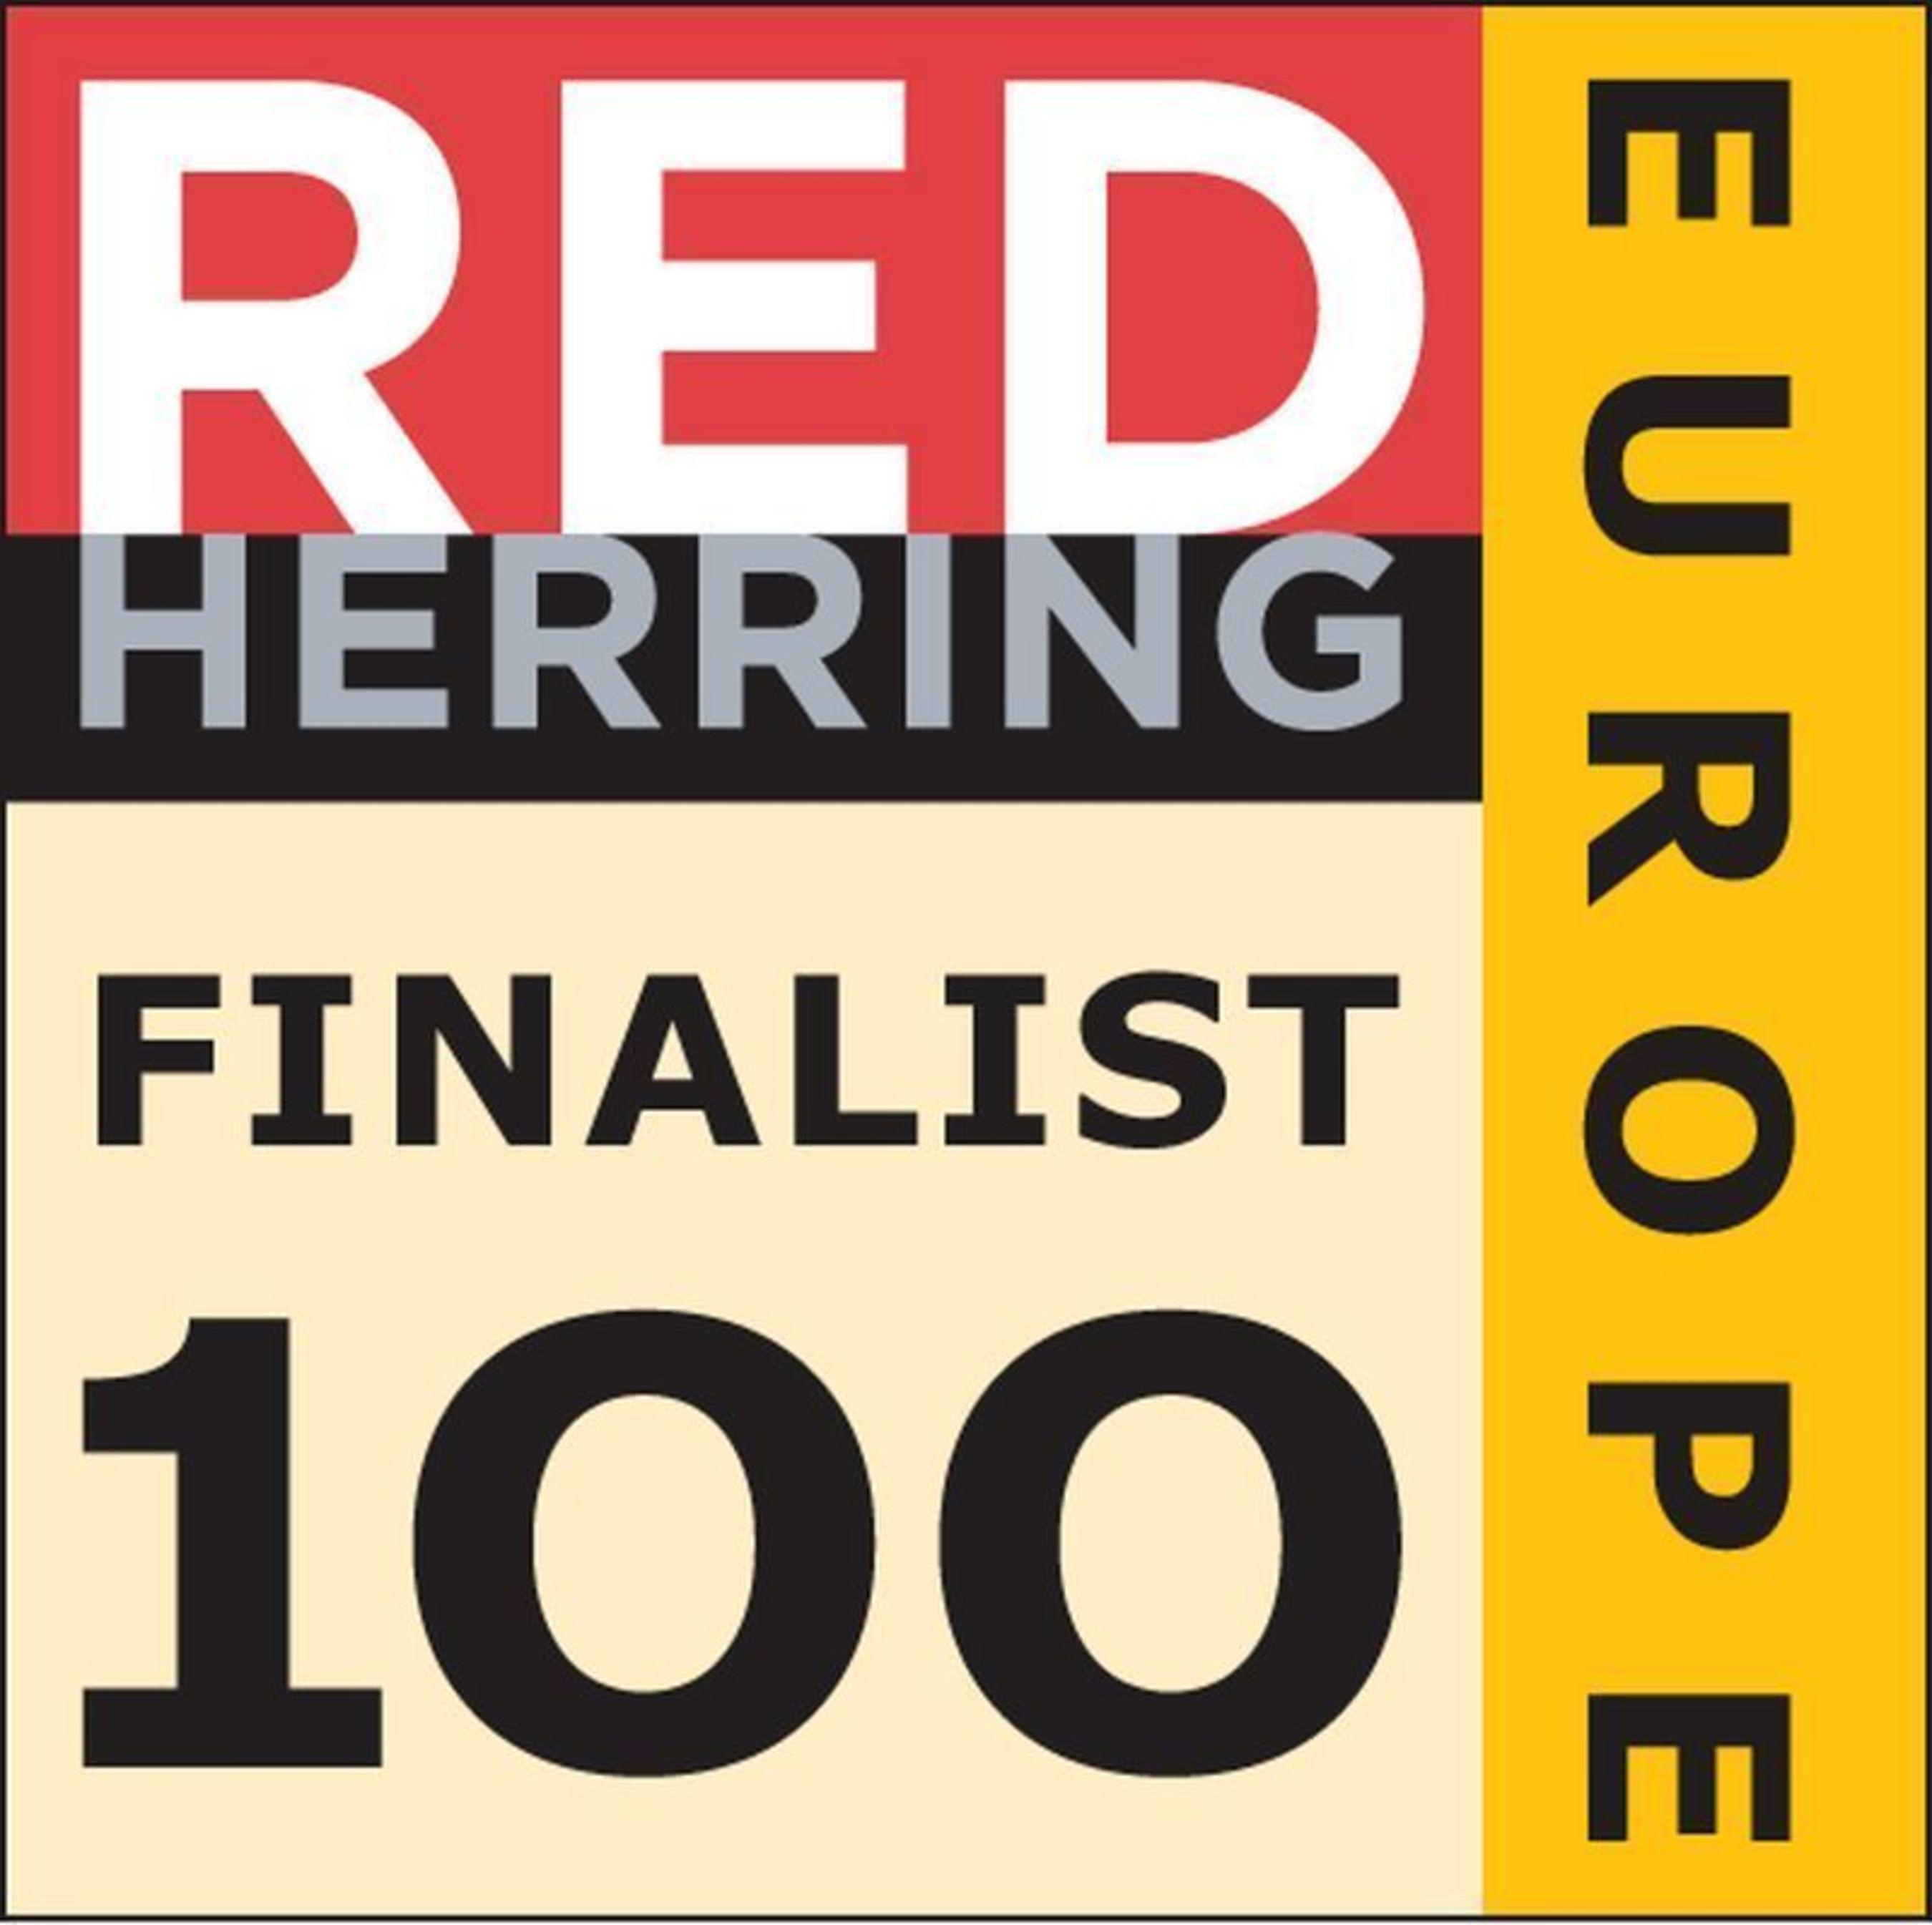 Red Herring Top 100 Europe Finalist (PRNewsFoto/Endobetix Ltd.)